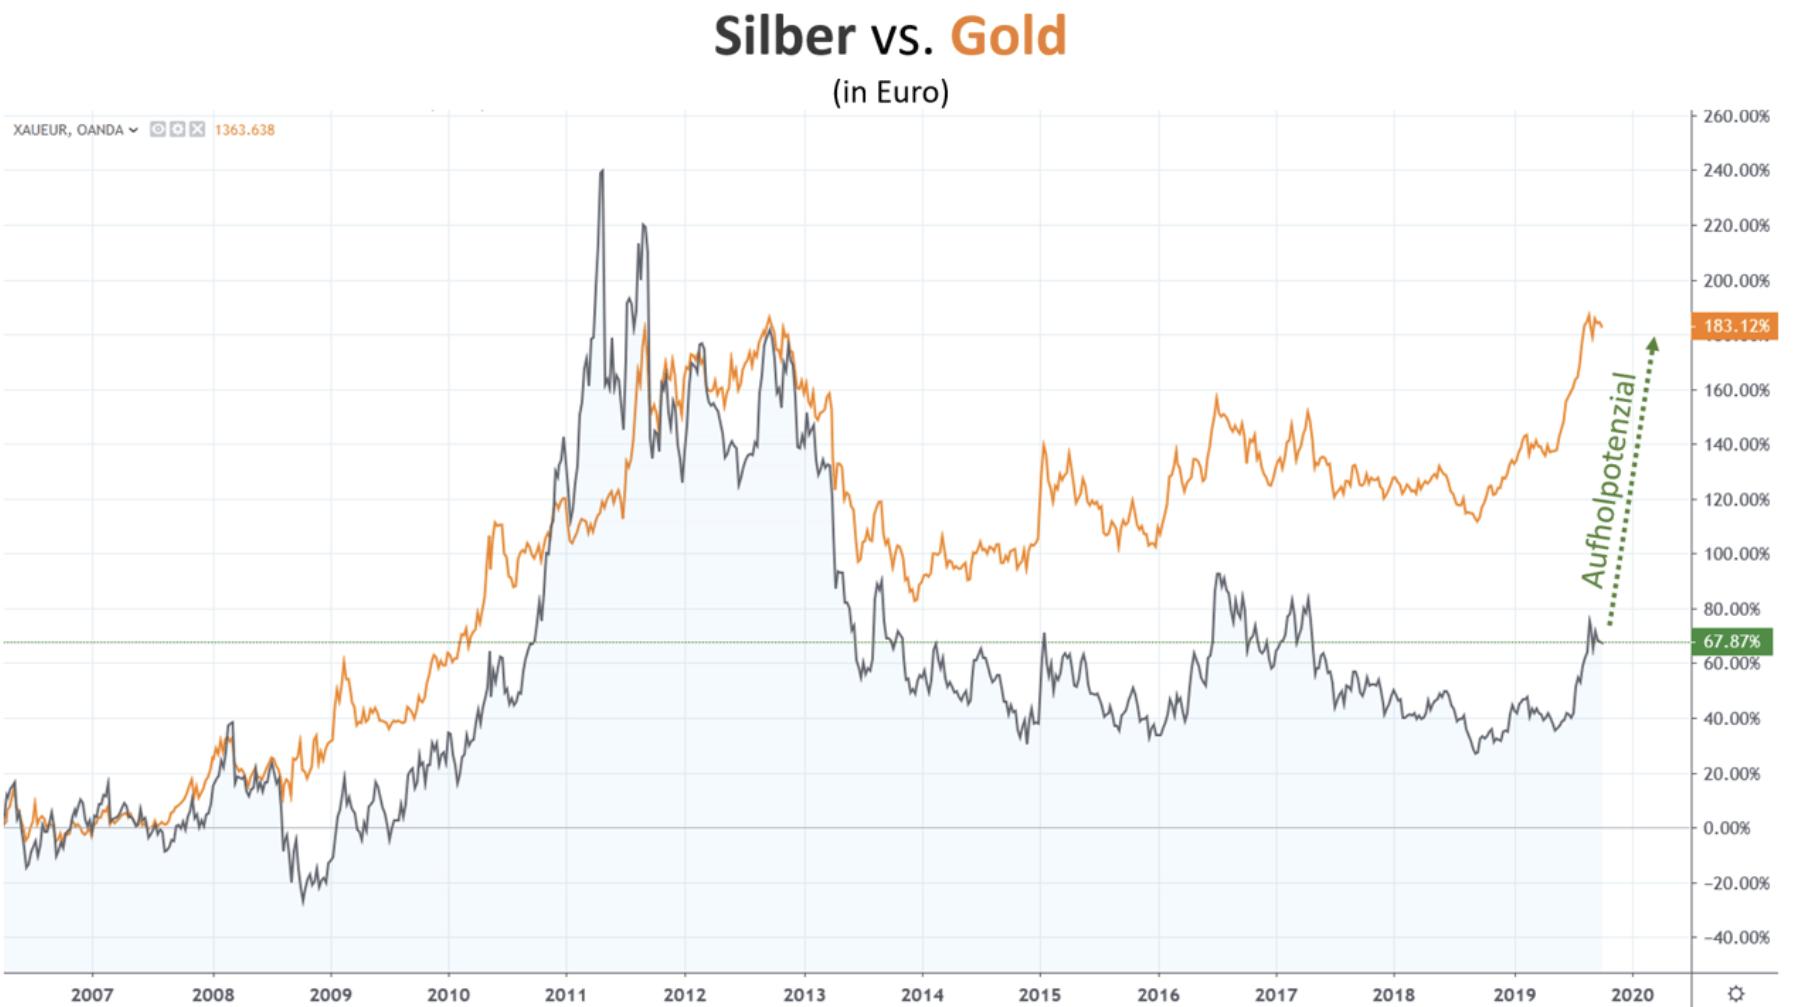 Silber vs Gold